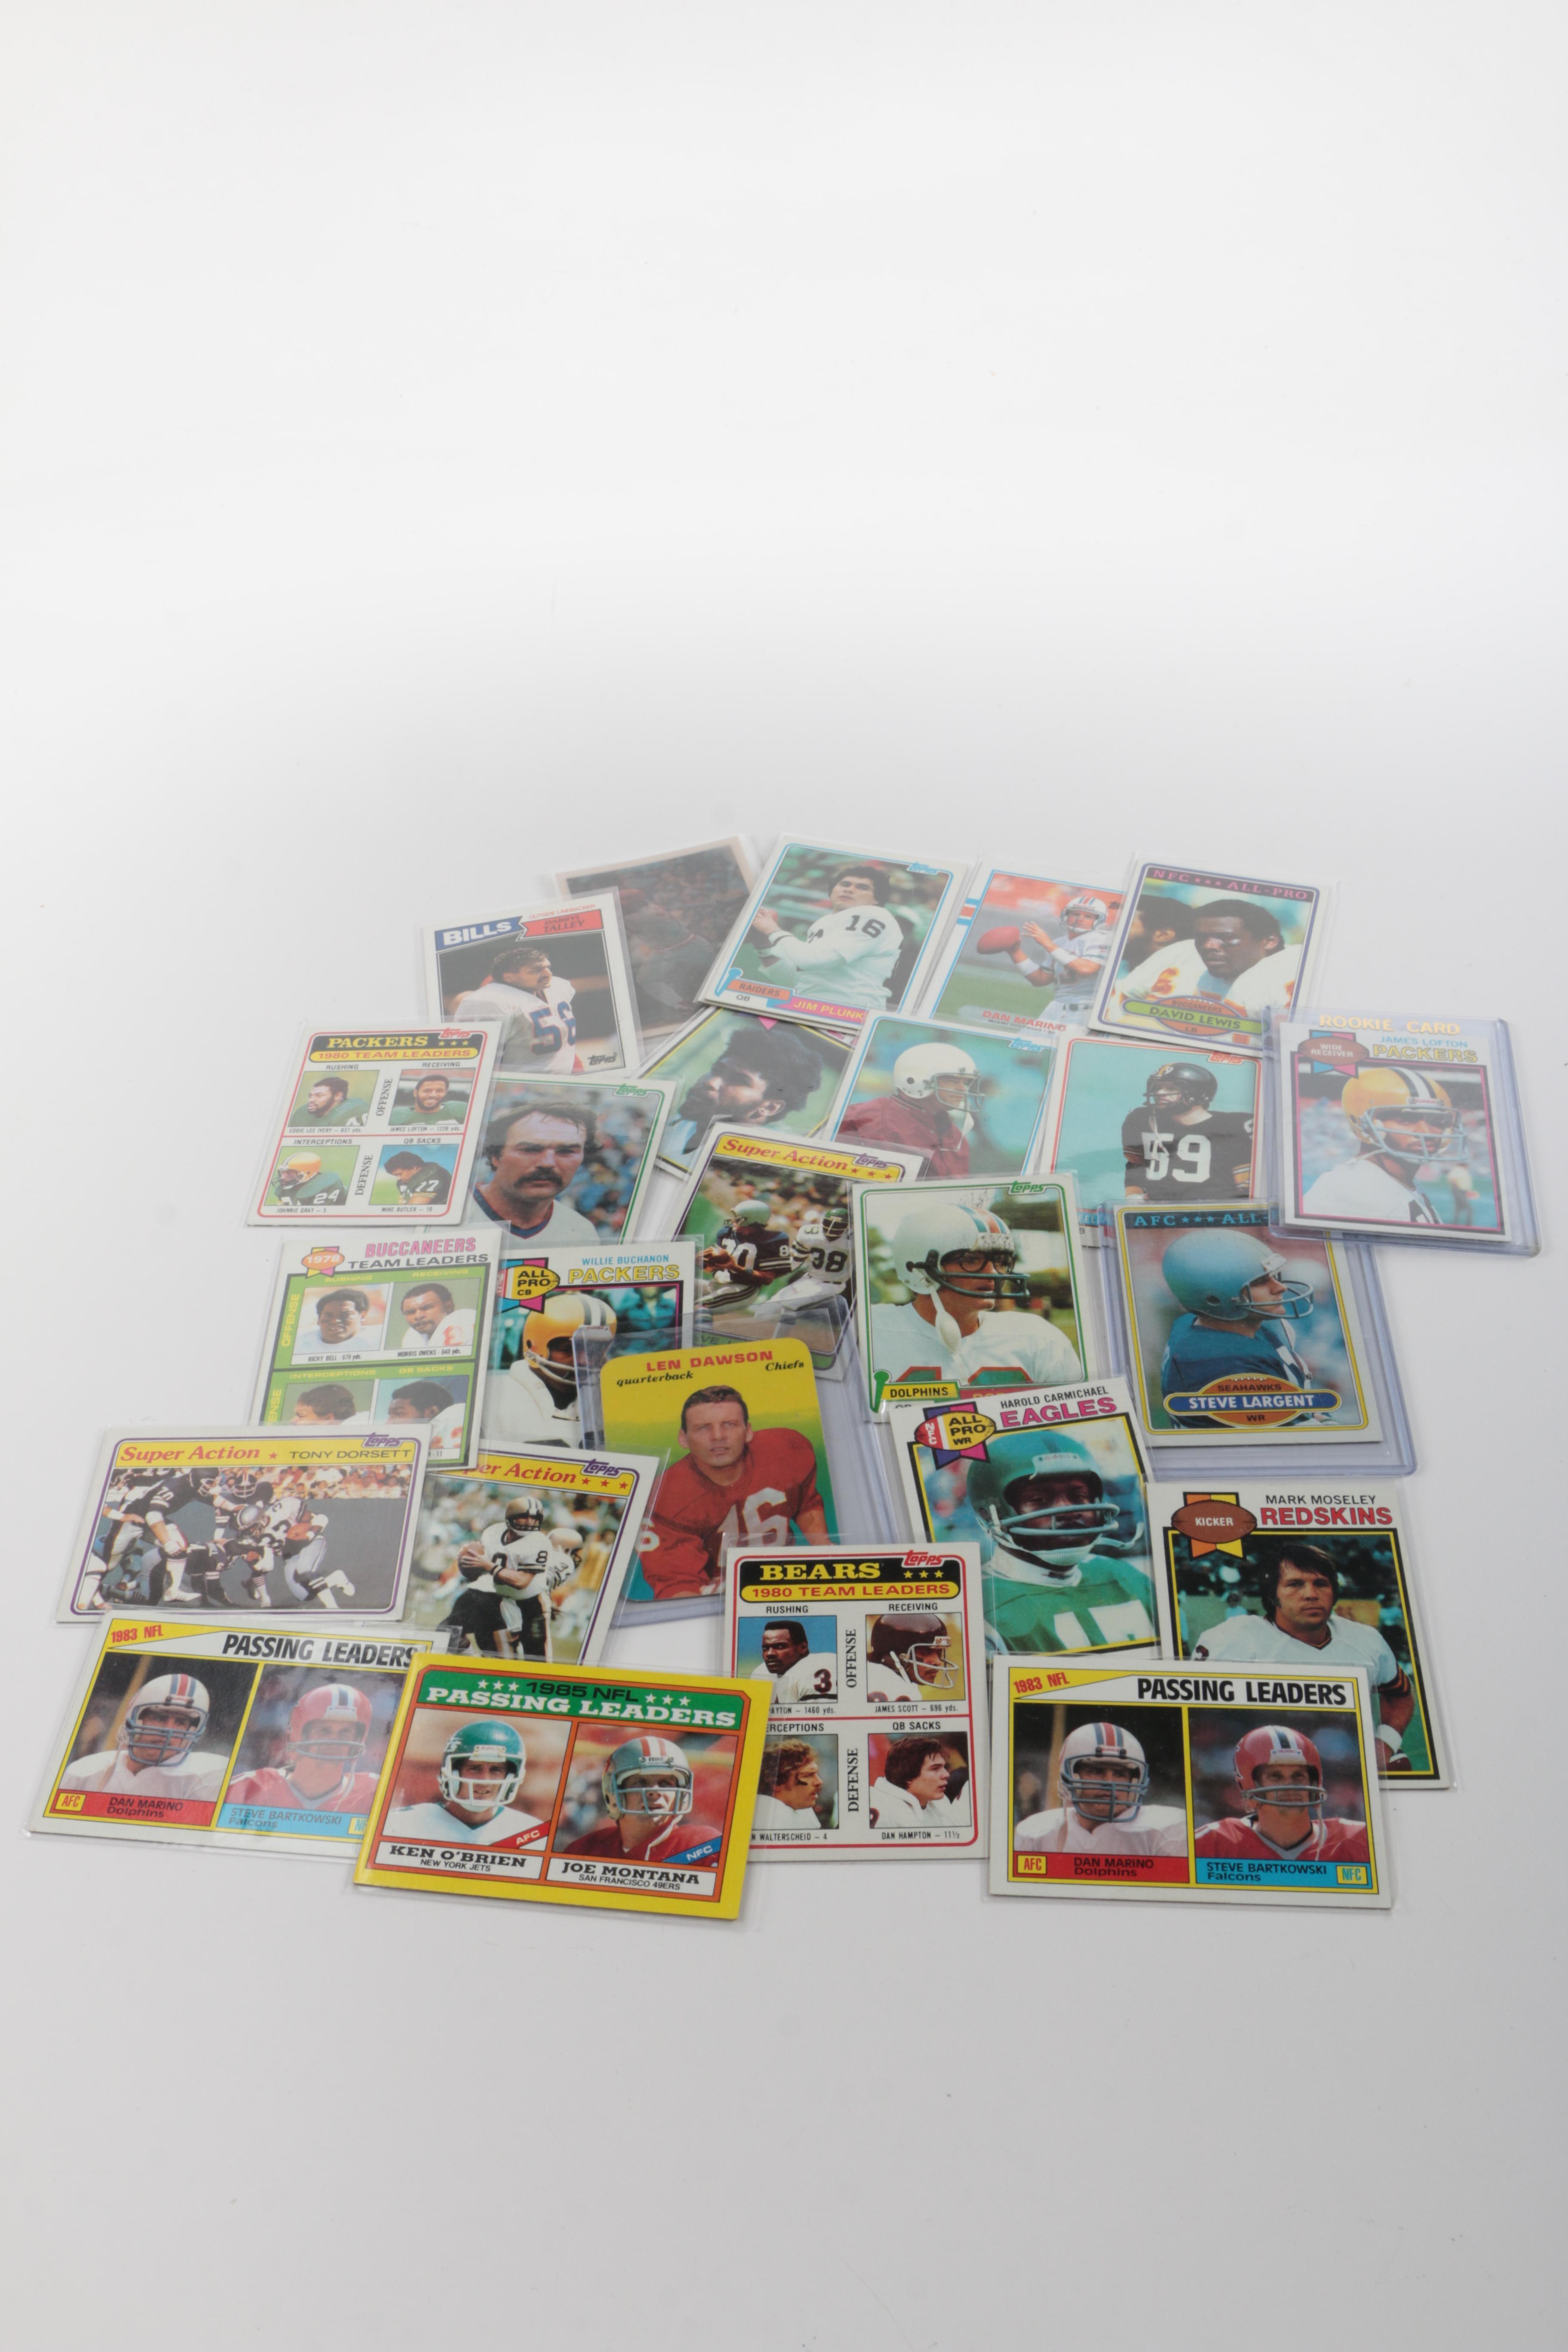 Vintage Football Cards Including James Lofton Rookie Card